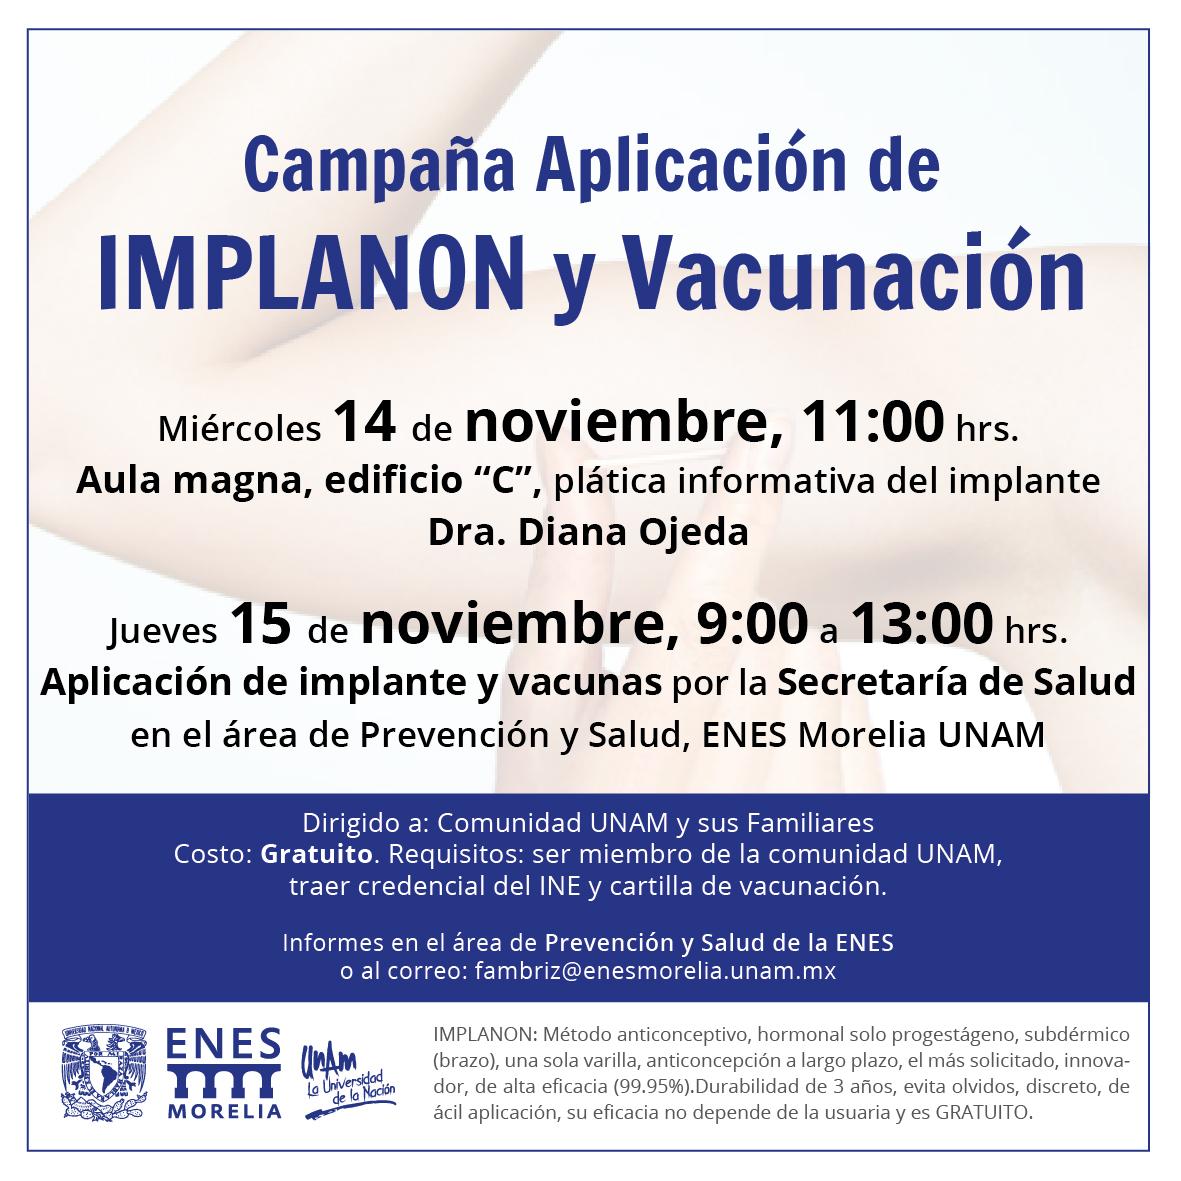 Vacunas-implanon-2018-01